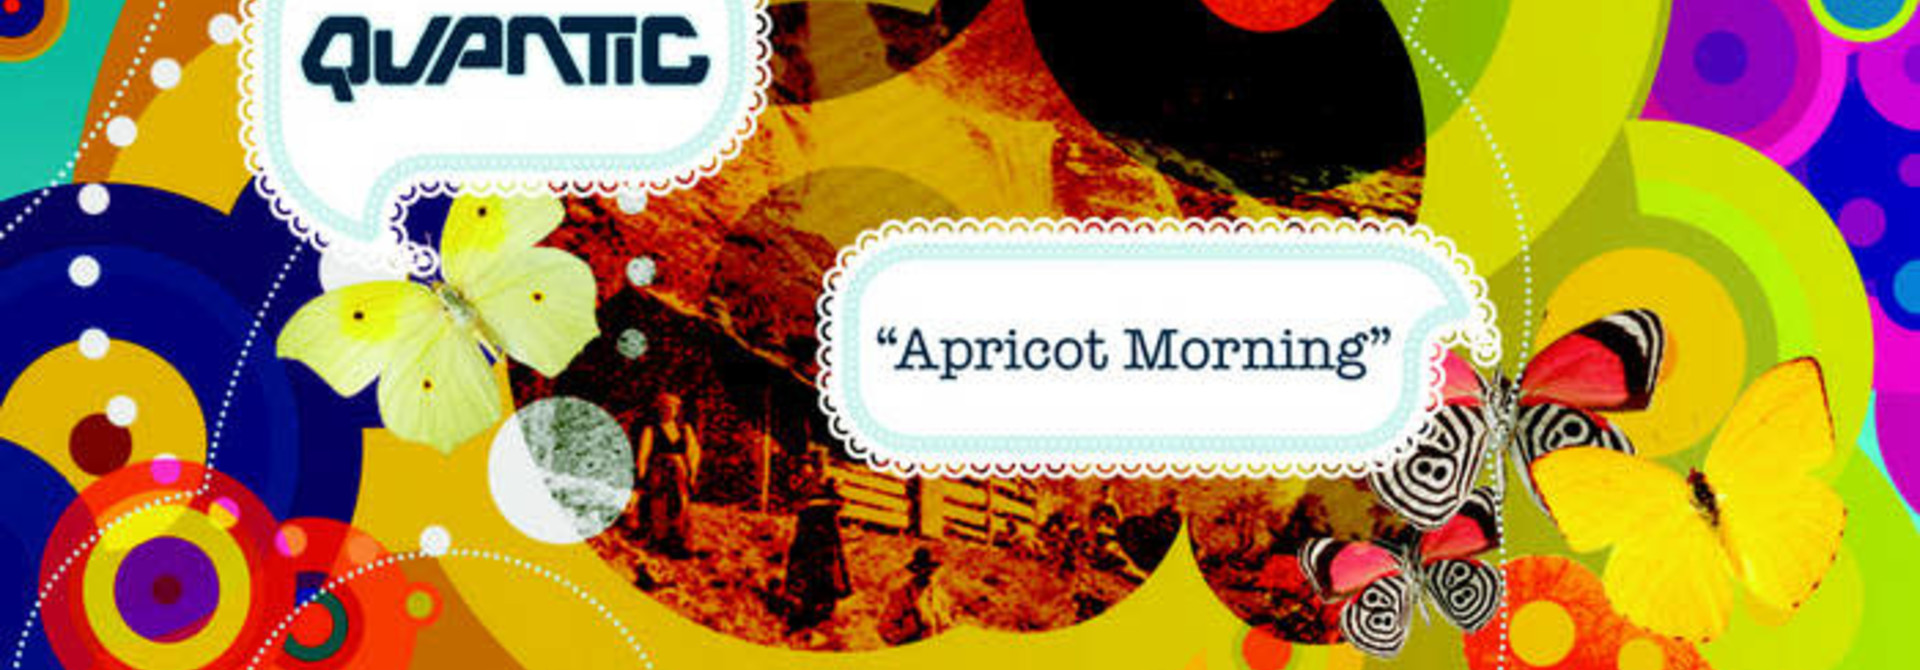 Quantic • Apricot Morning